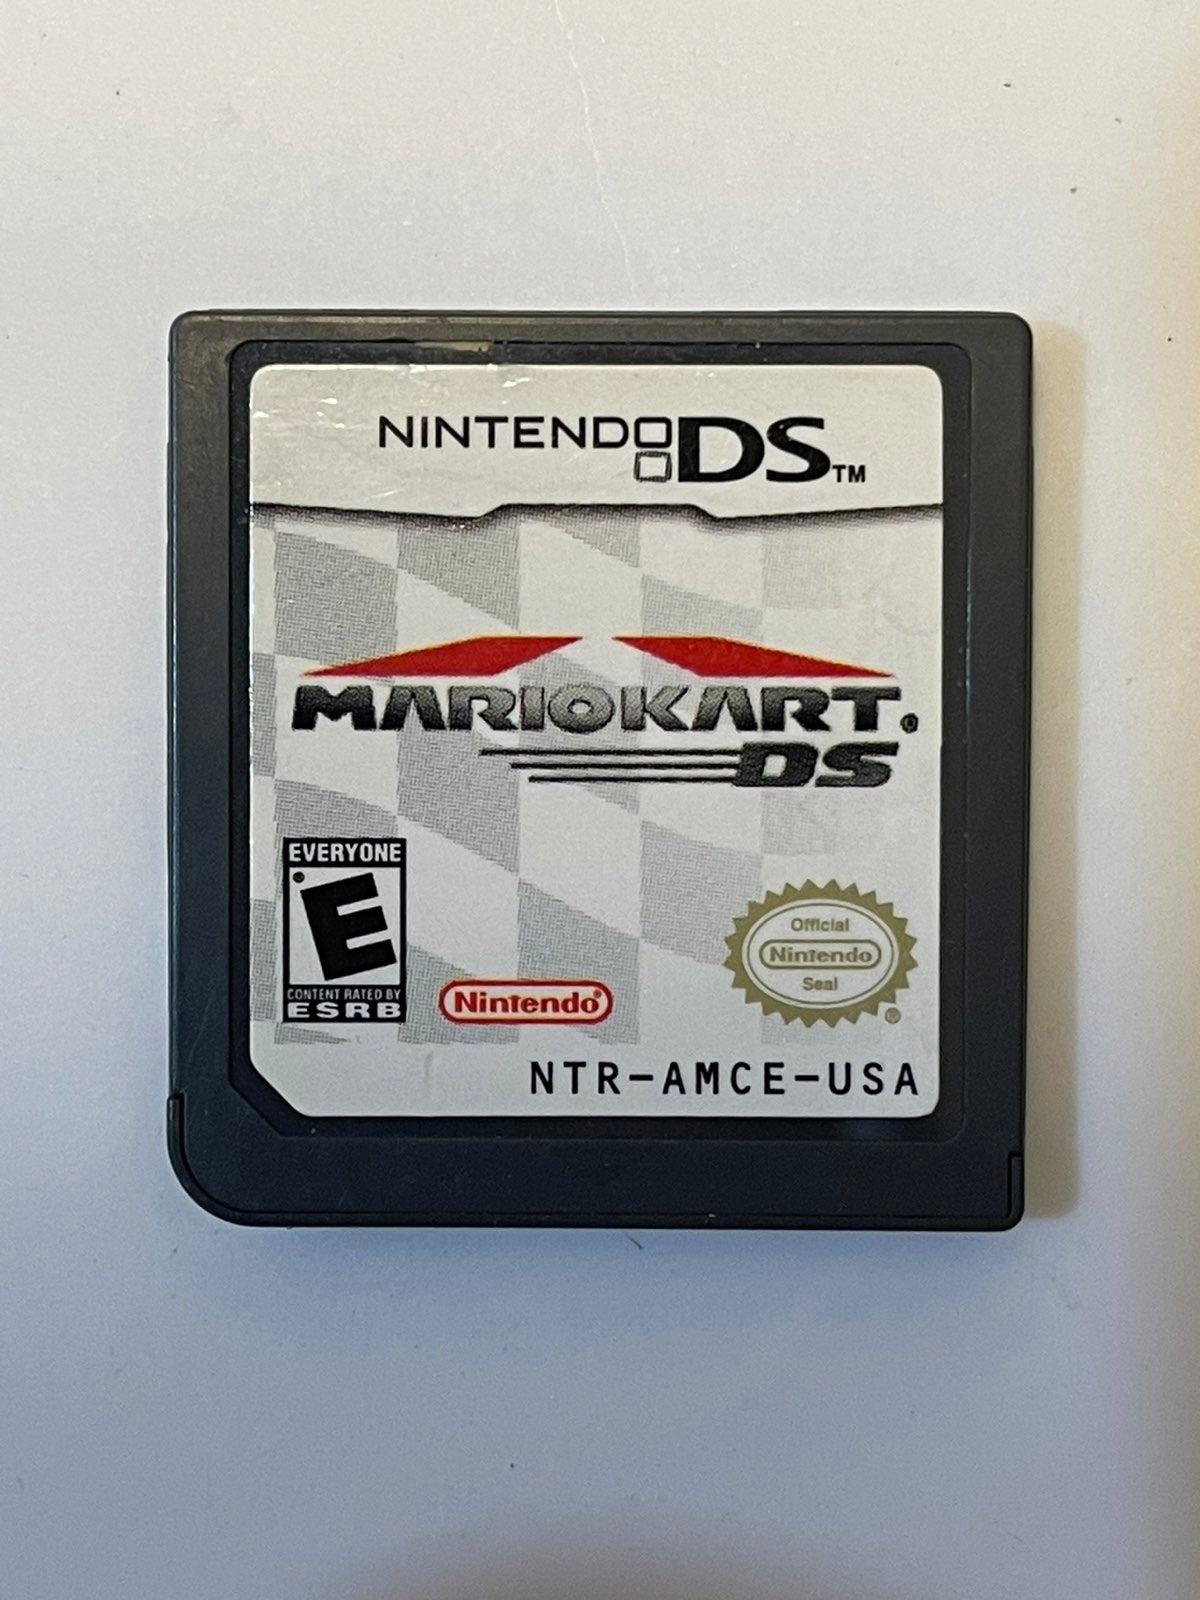 Mario Kart DS on Nintendo